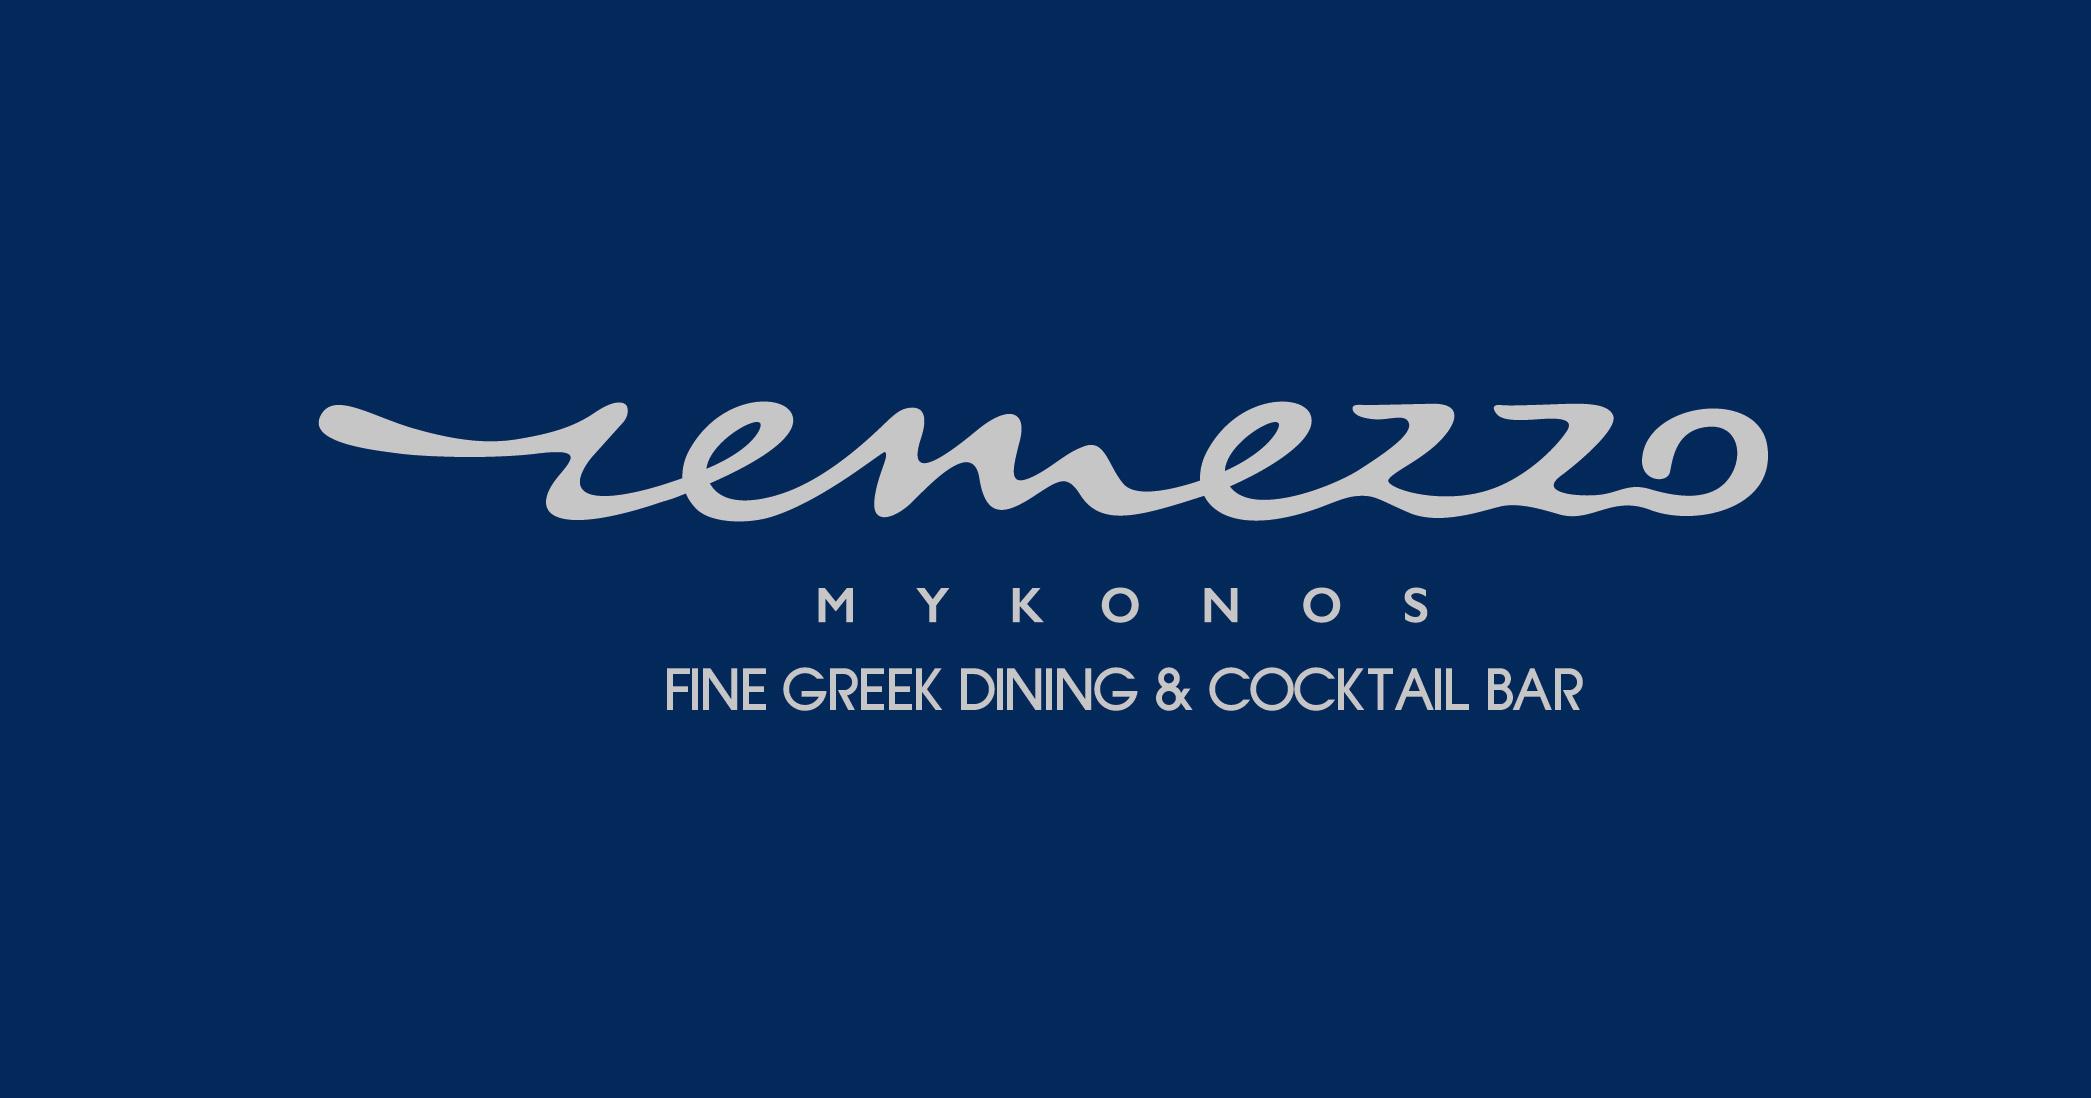 Remezzo-logo